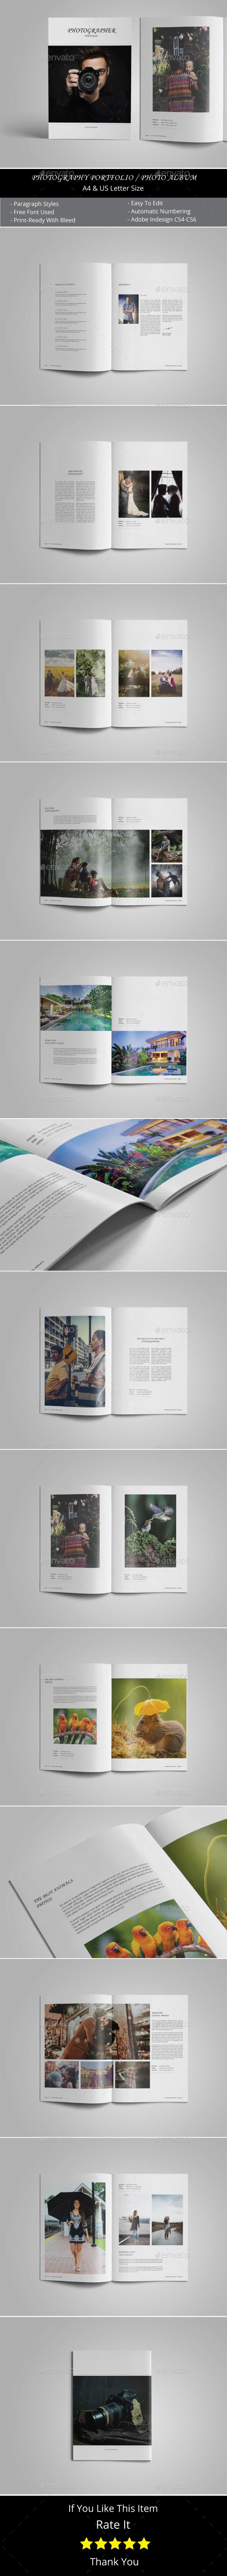 Photography Portfolio or Photo Album Template - Photo Albums Print Templates